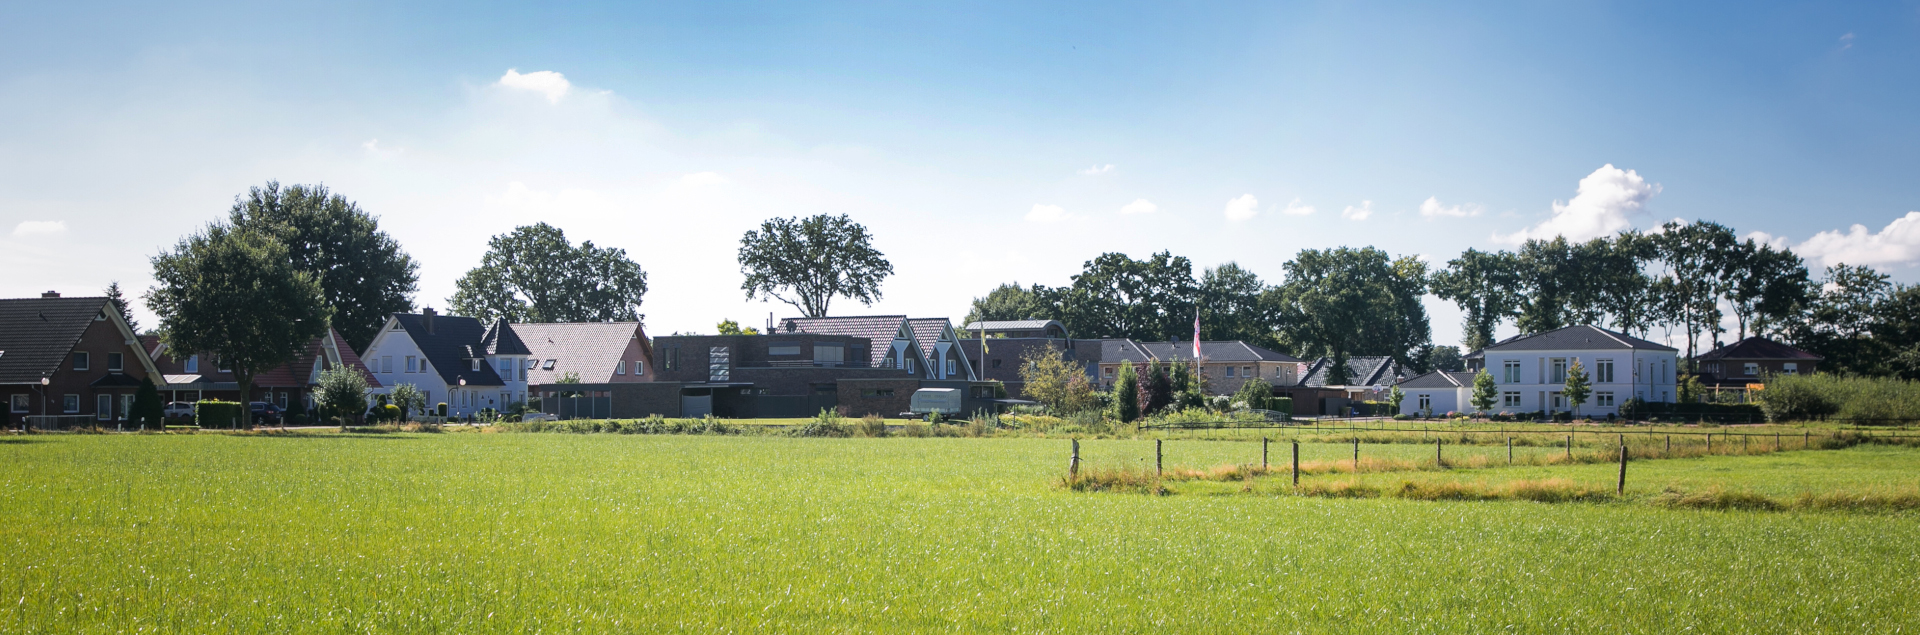 Baugebiet Hahnefehn